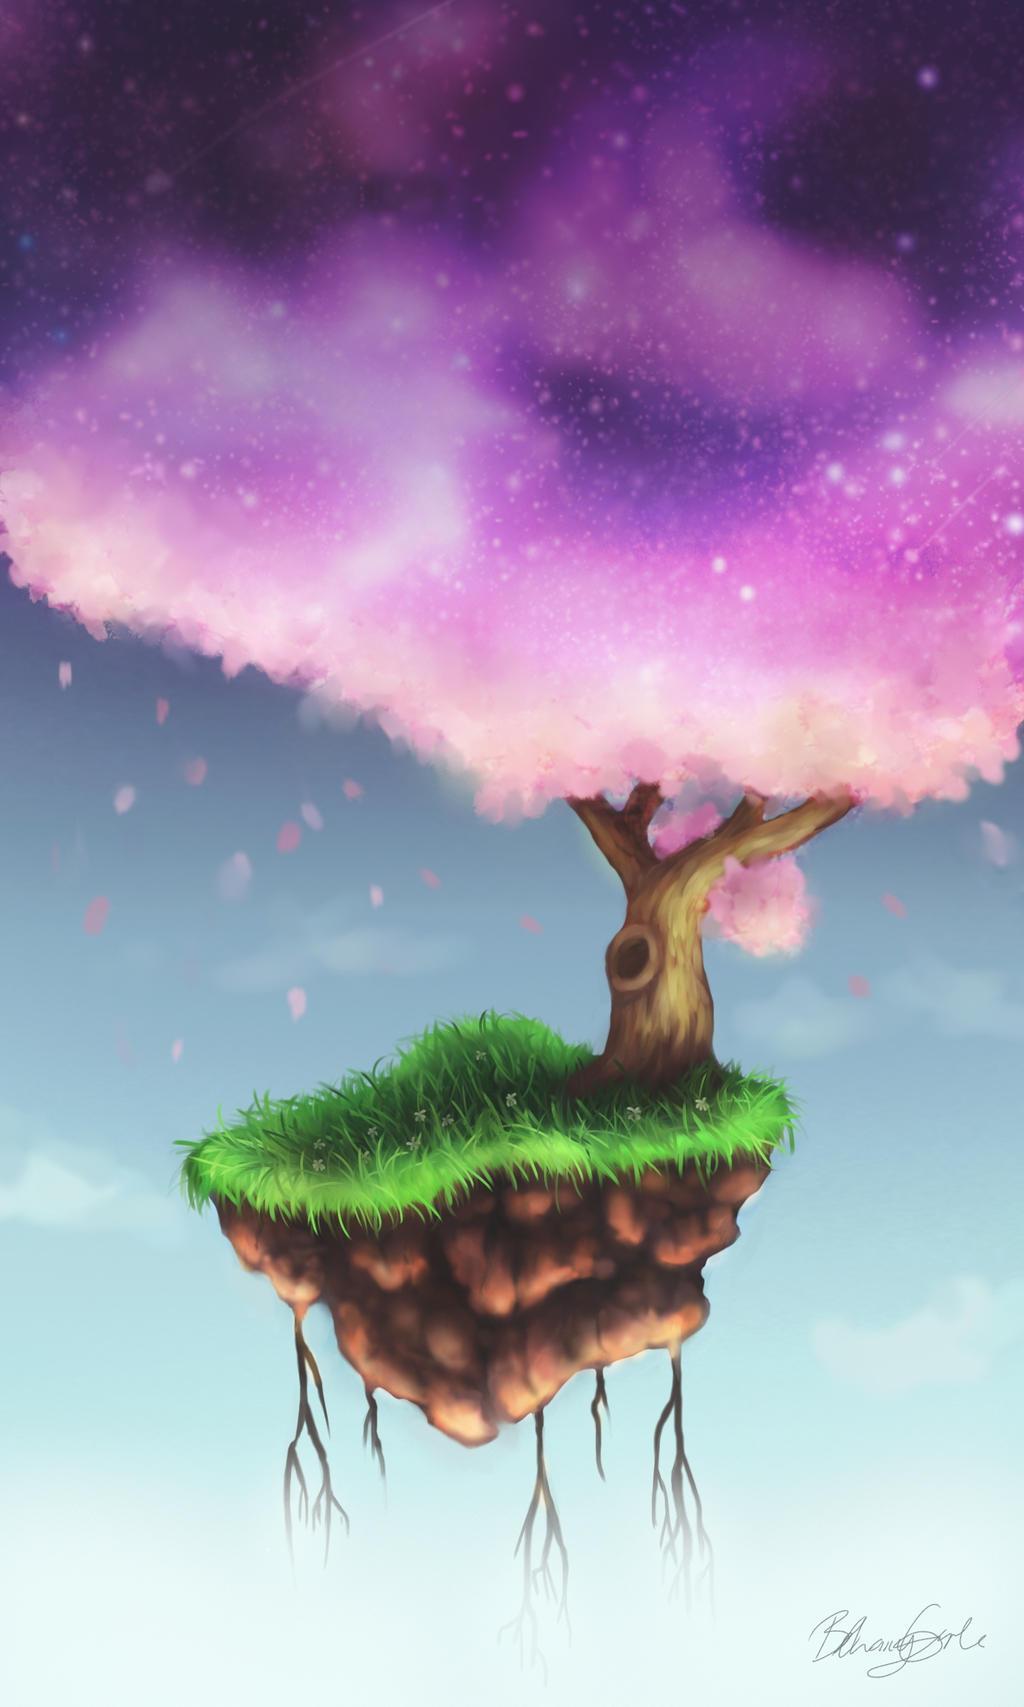 The Tree of Thought [Personal] by XXThePurpleDragonXX